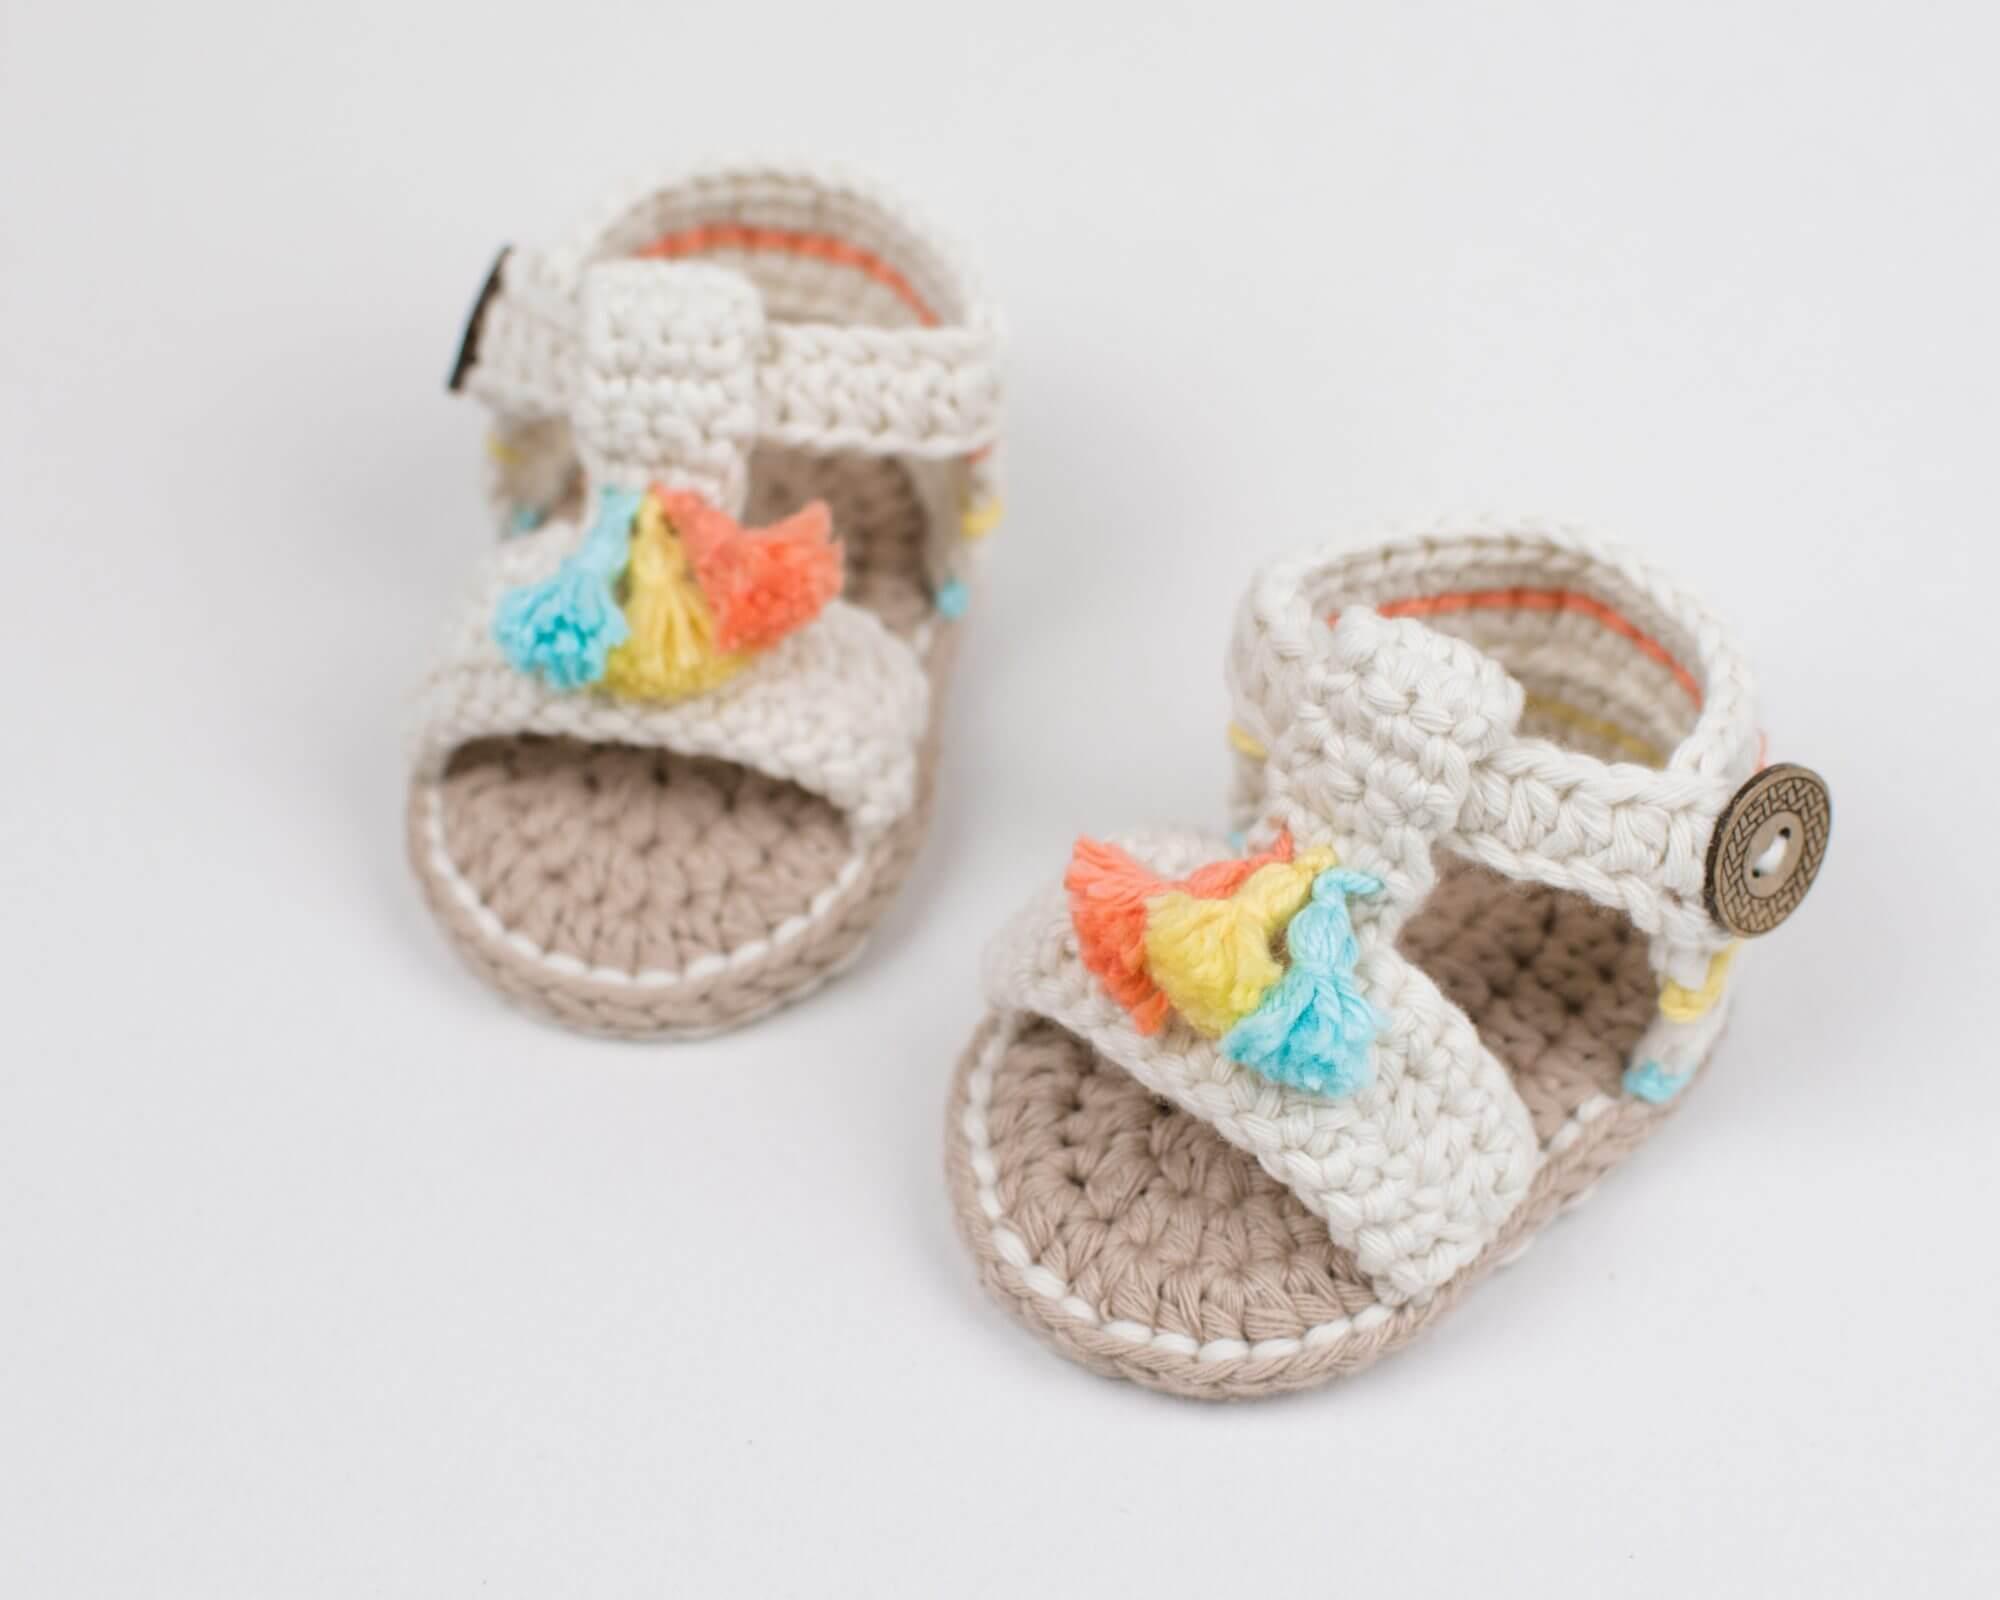 Boho Baby Crochet Sandals - Free